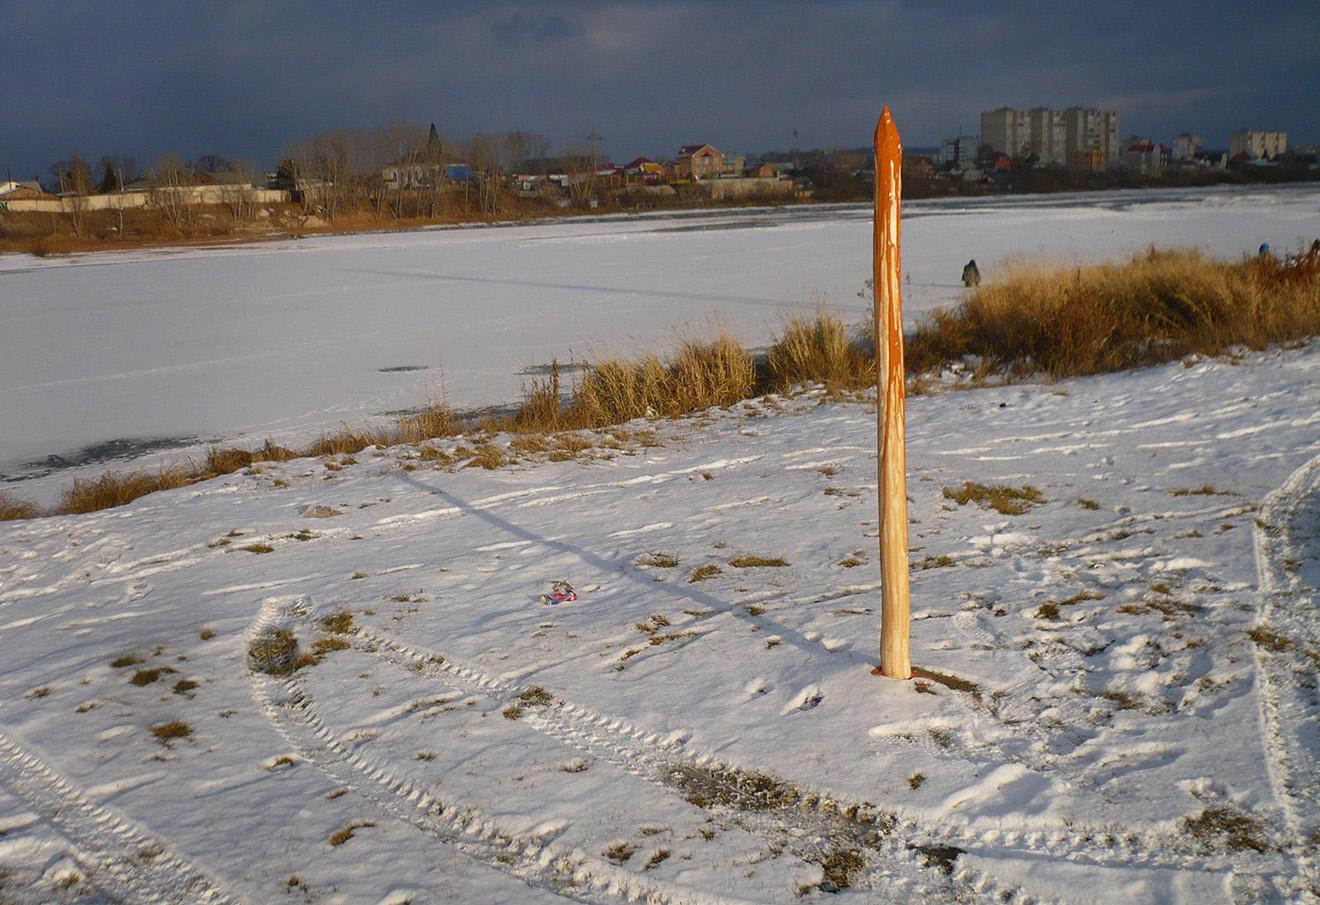 «Памятник» Ивану Грозному в виде деревянного кола на берегу реки Кан. Фото: Владислав Гультяев / «ВКонтакте»